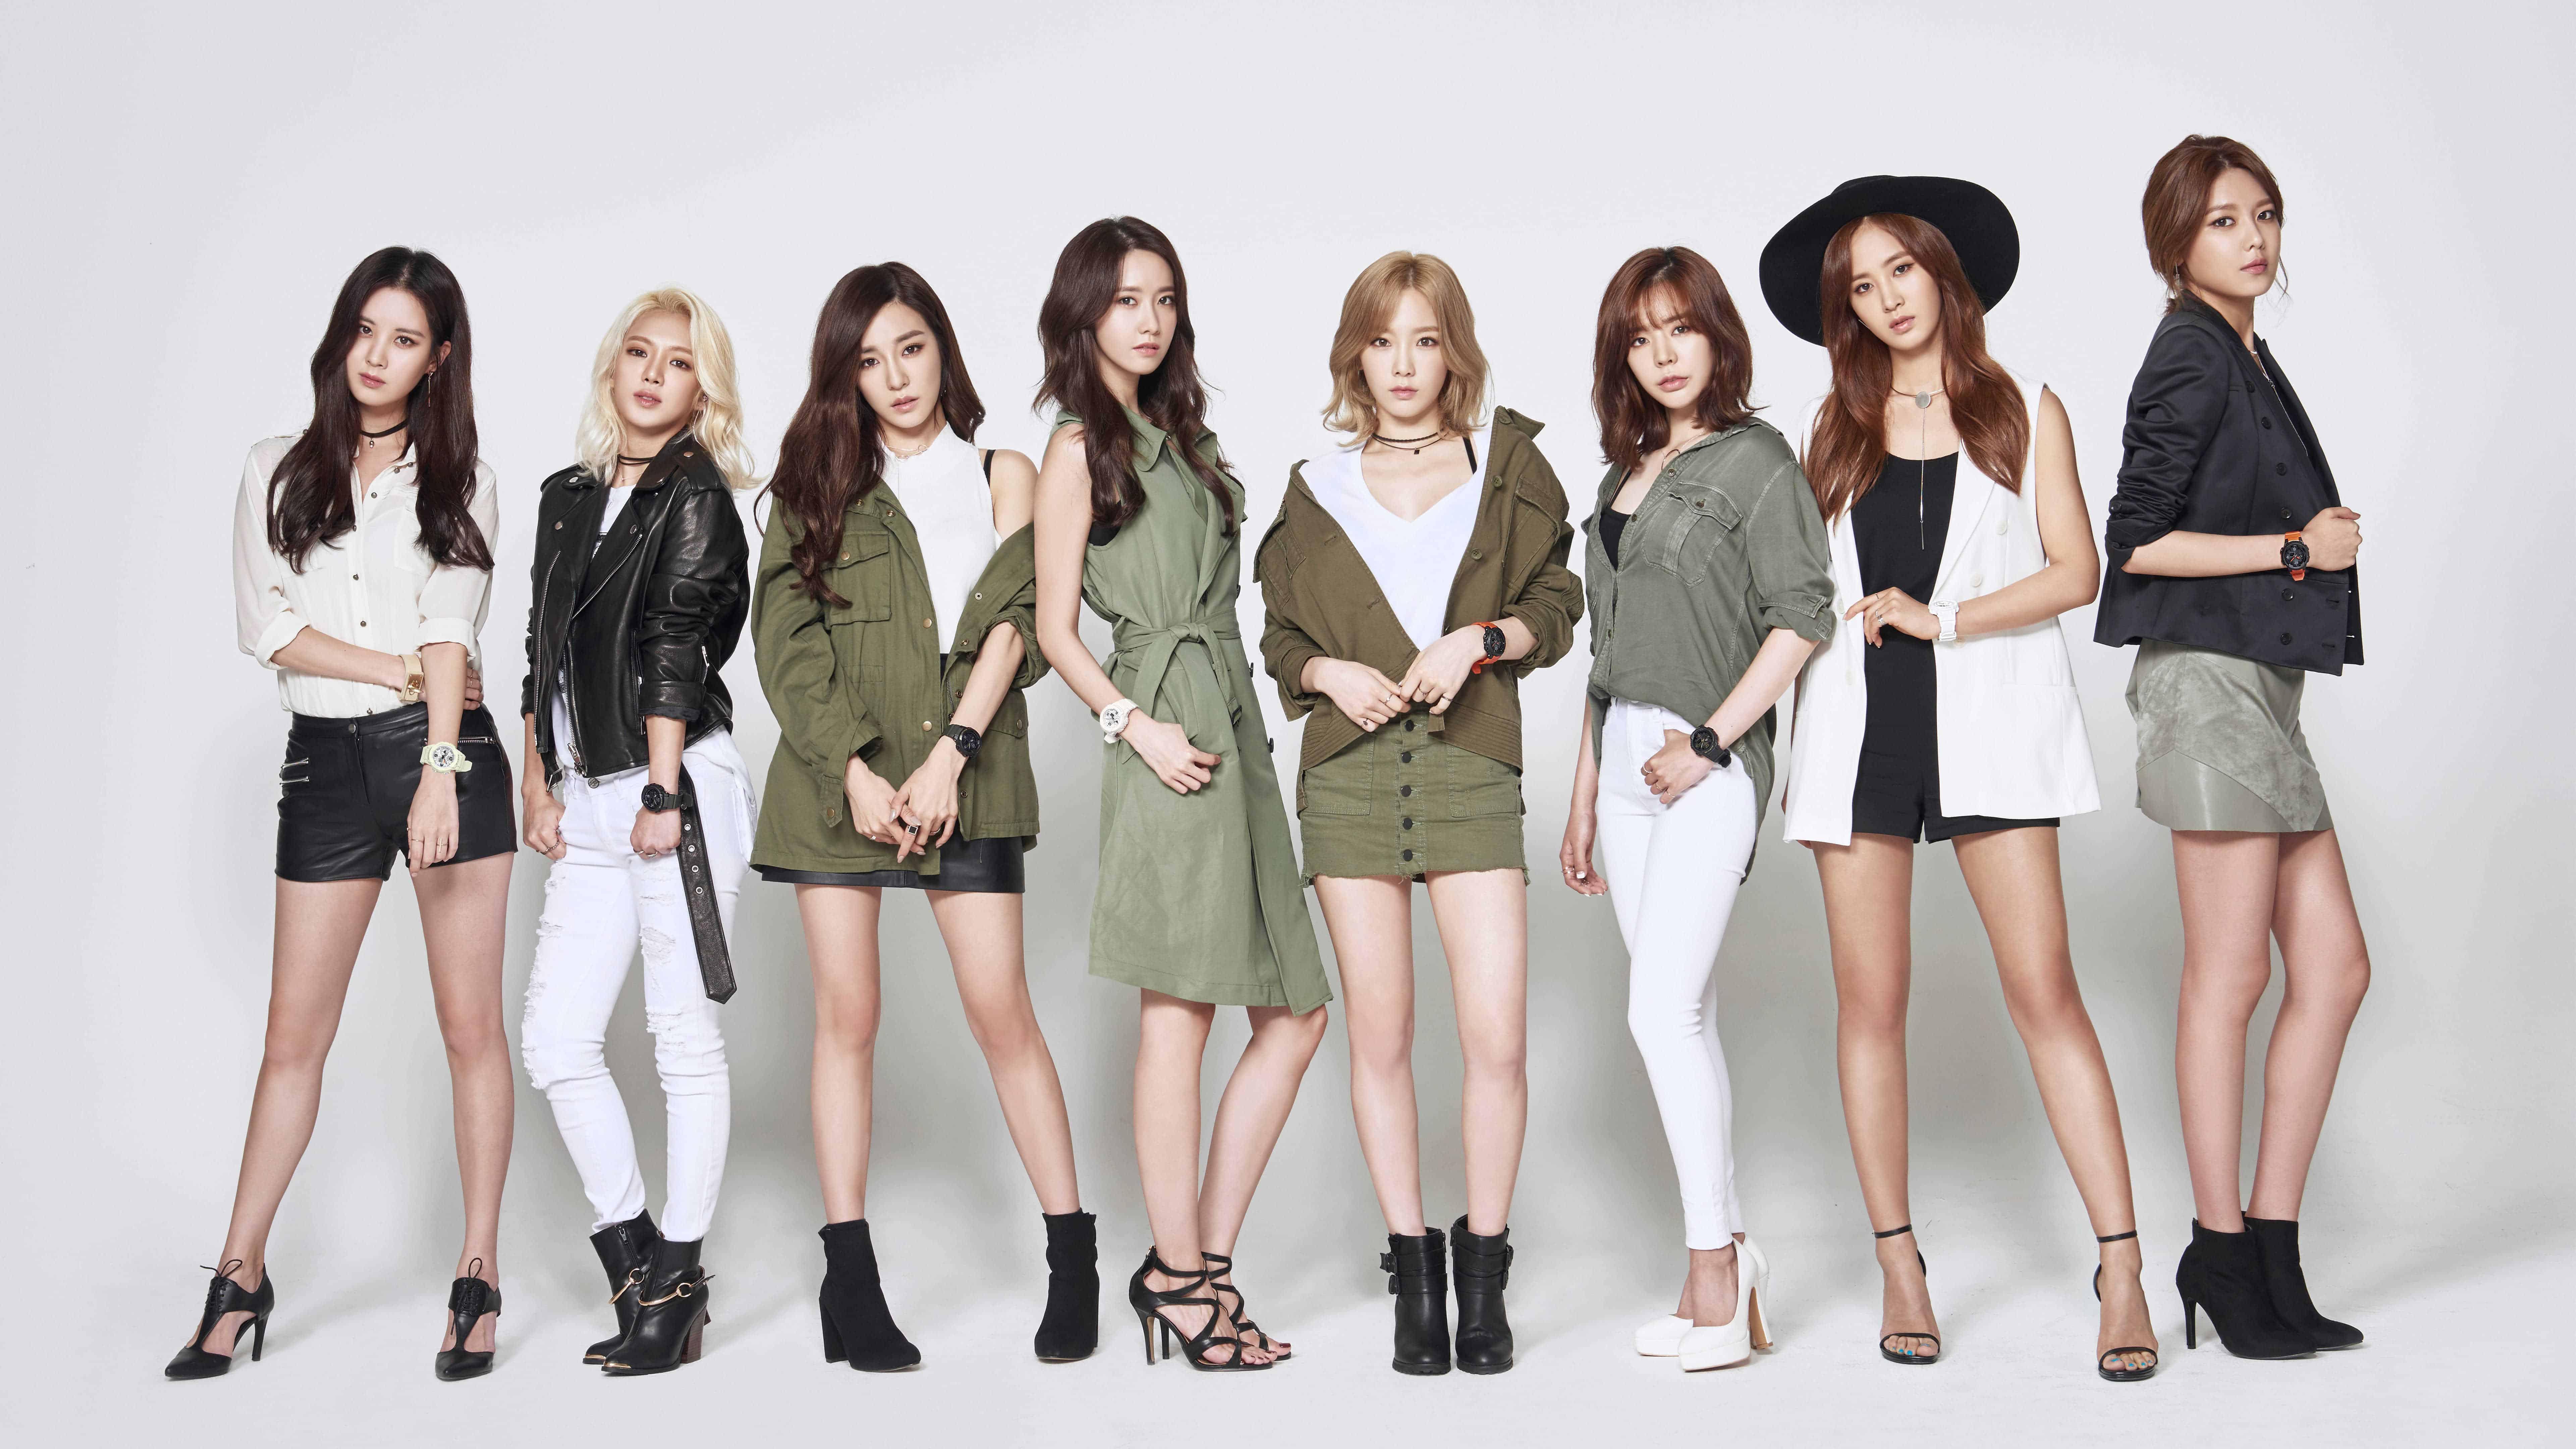 Girls Generation Wallpaper 2017 Ot9 Girls Generation Members Casio Photoshoot Uhd 8k Wallpaper